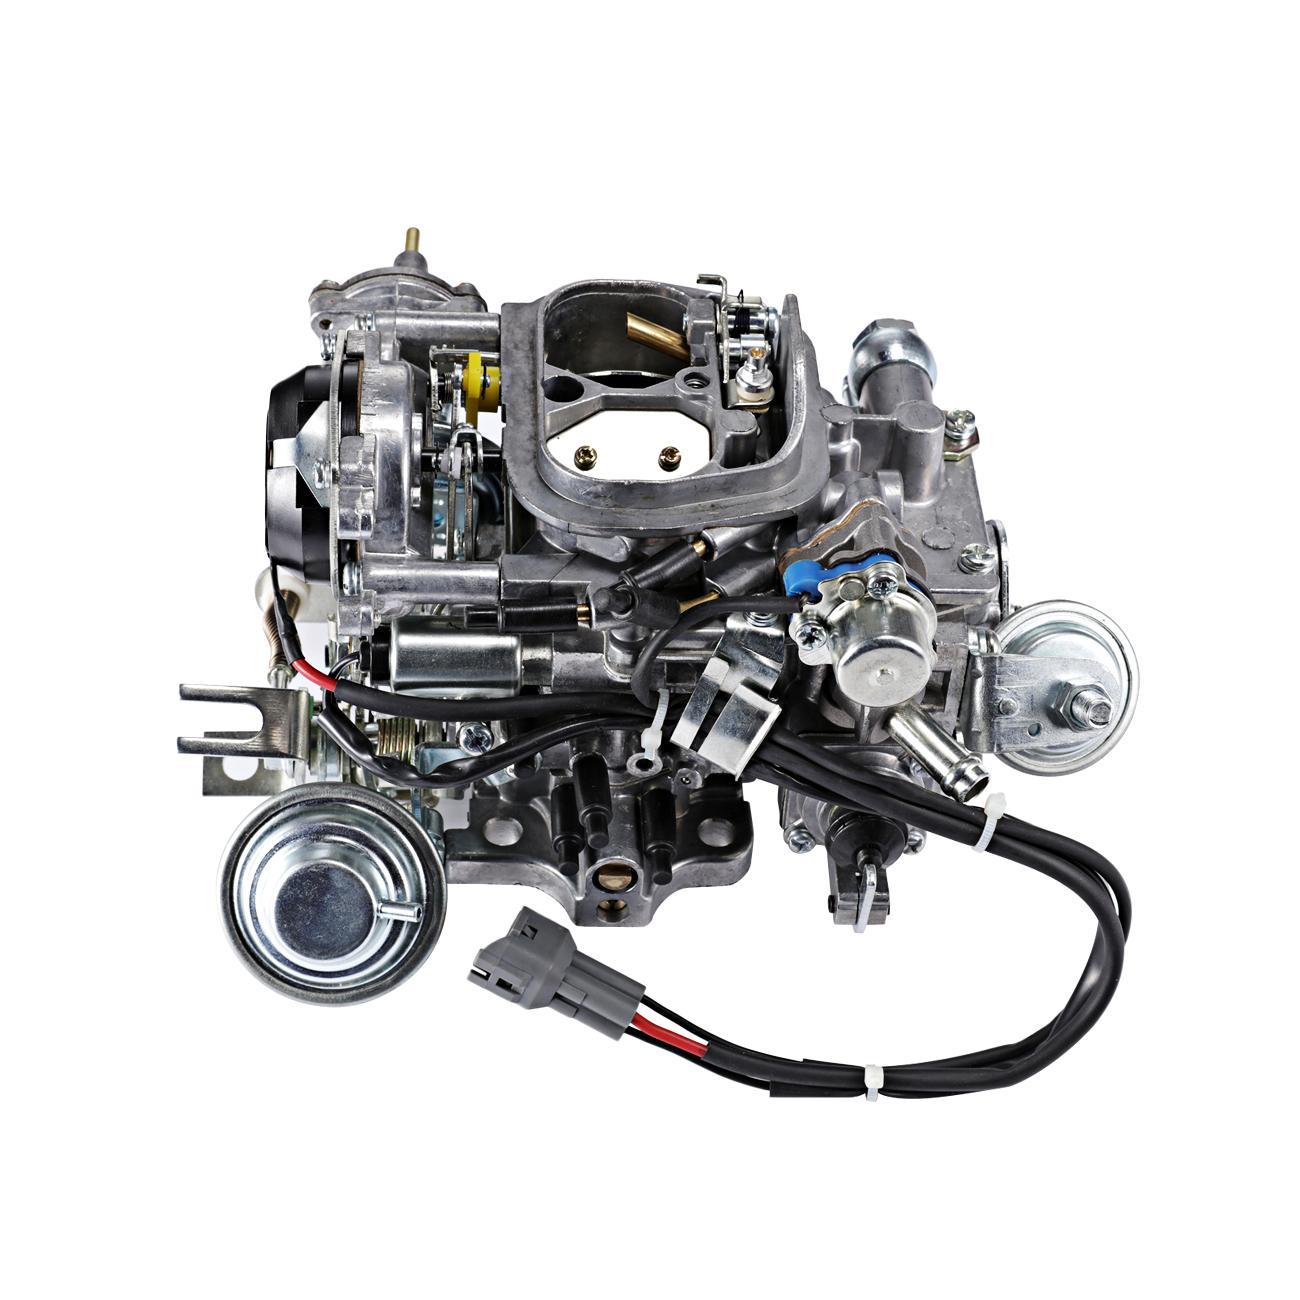 21100 35463 carburetor replacement for 22r toyota pickup. Black Bedroom Furniture Sets. Home Design Ideas